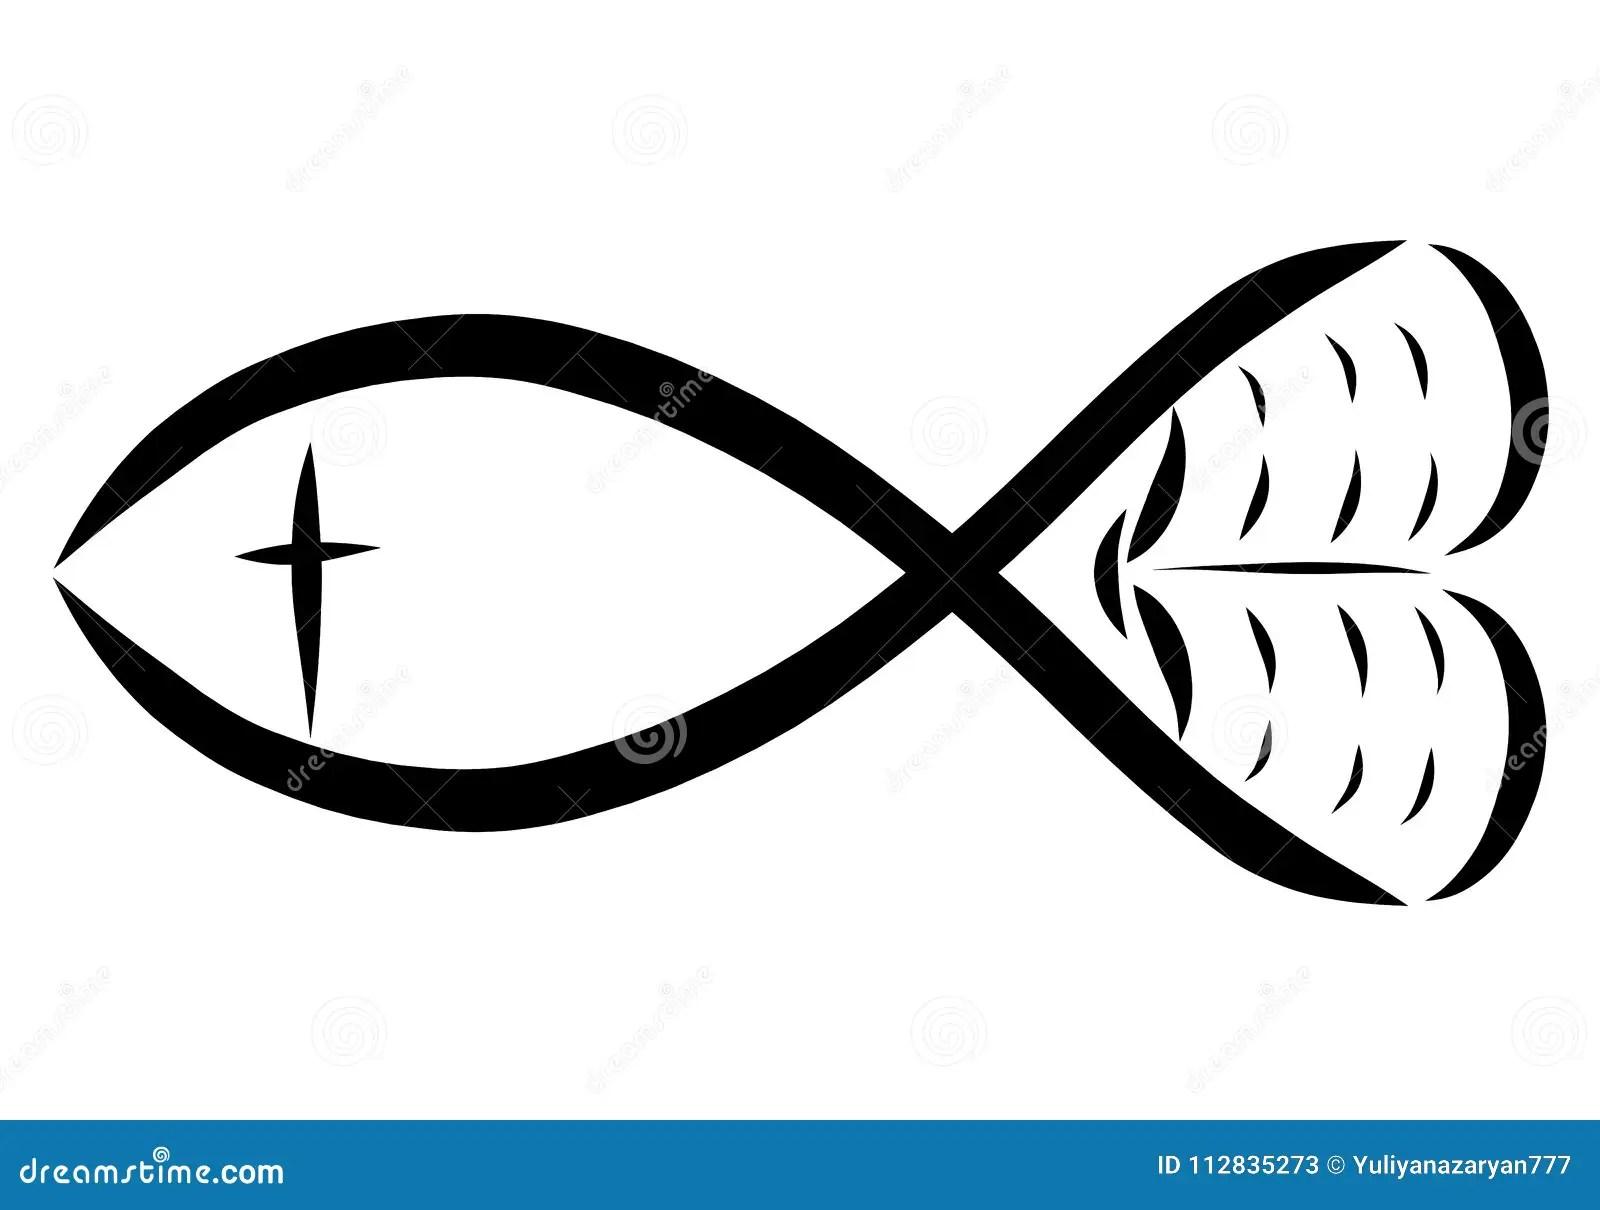 Fish Bible Cross And Heart Christian Symbols Stock